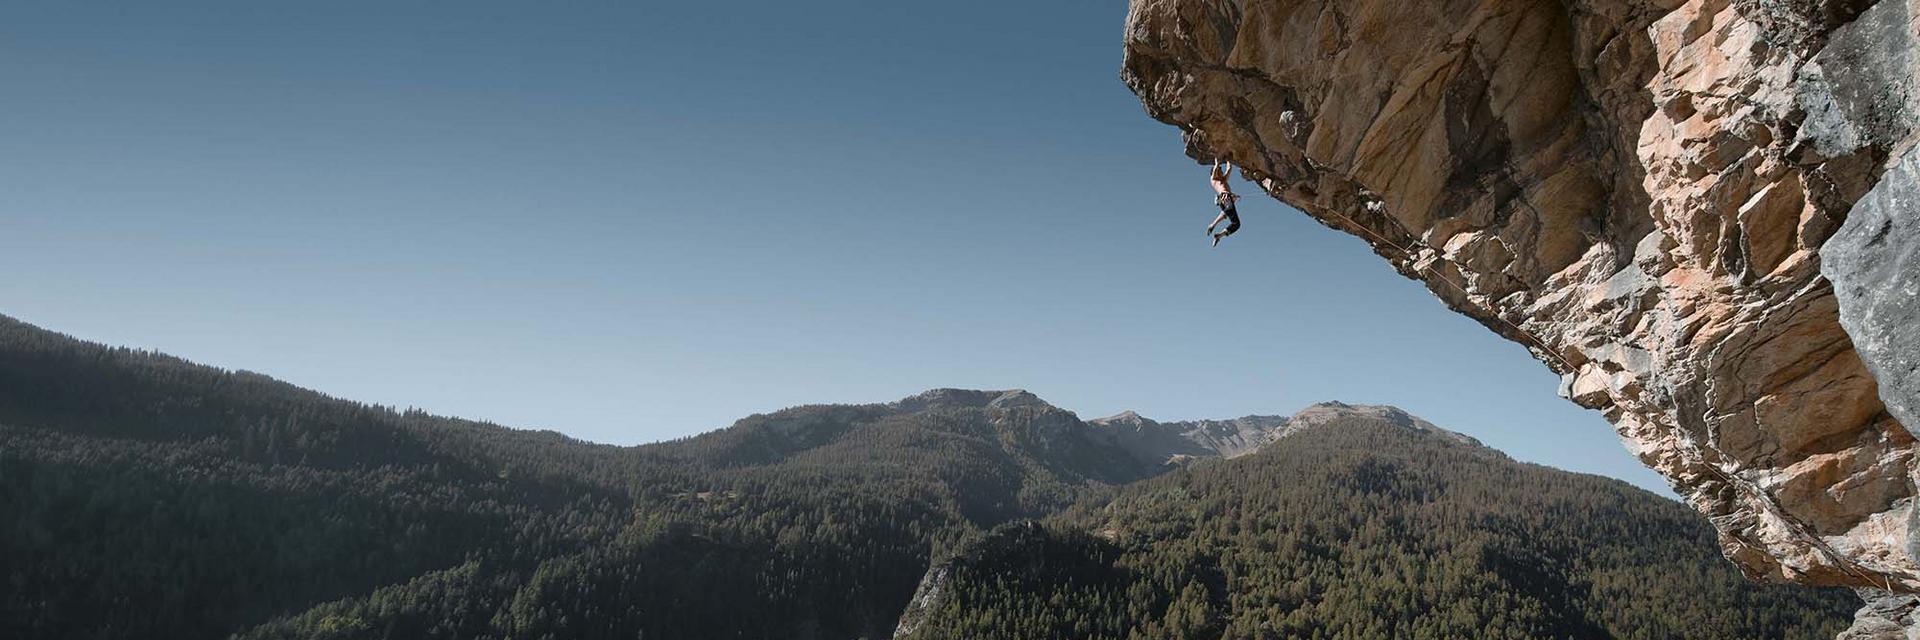 klettern in großer Höhe.